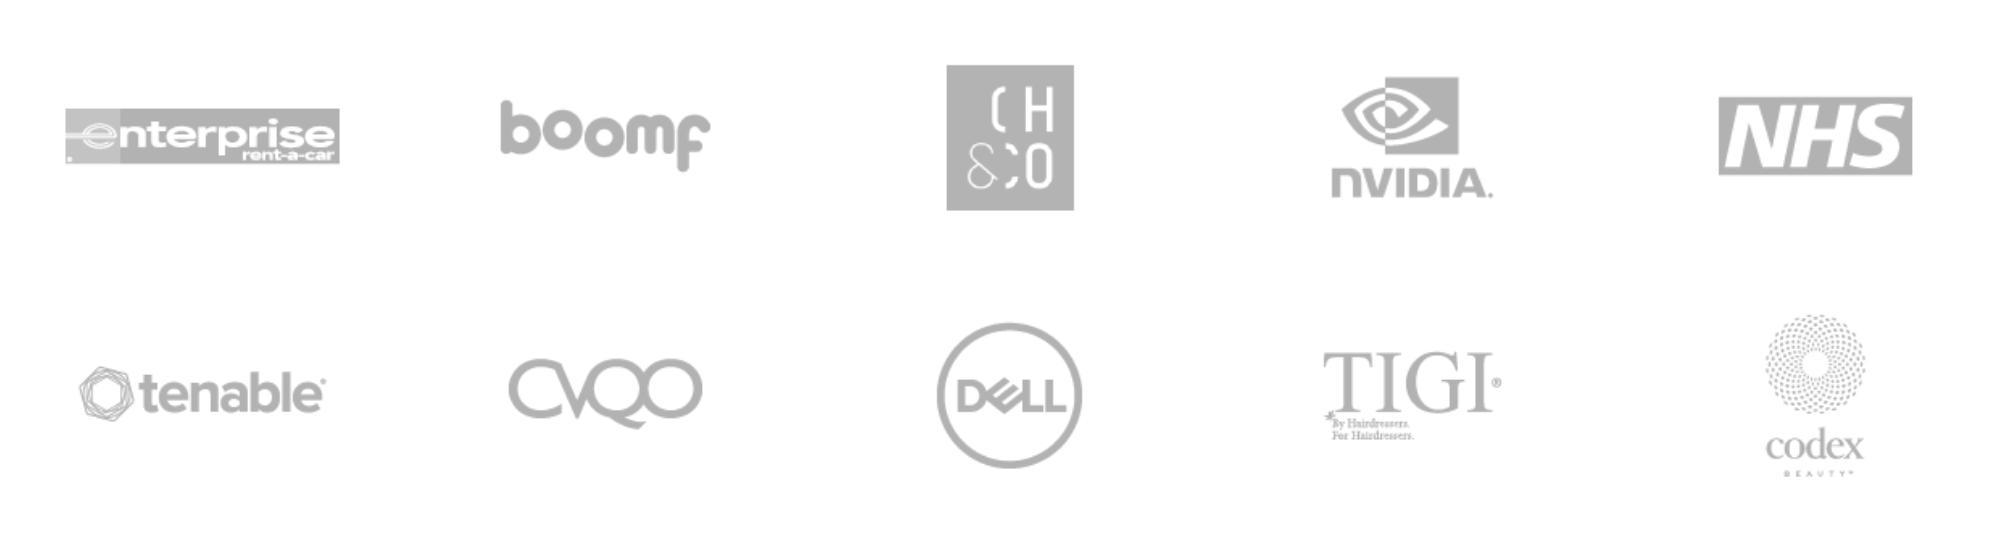 chroma client logos